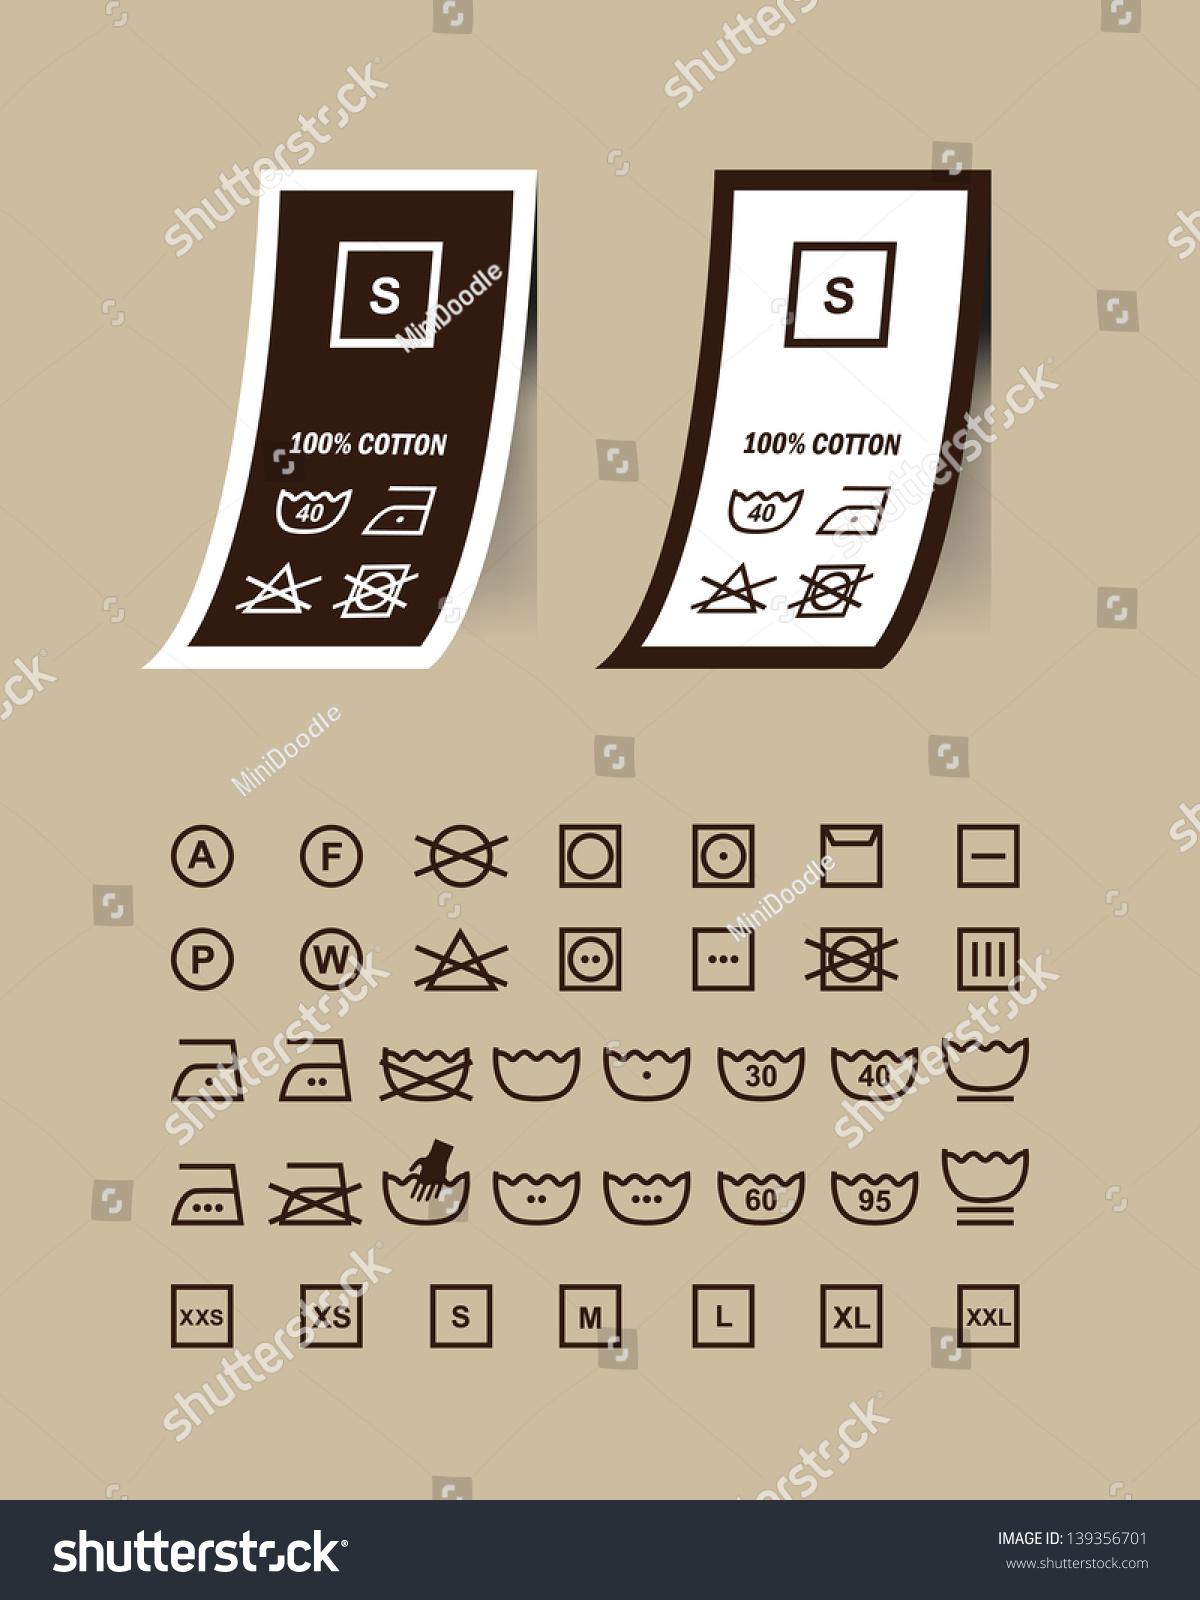 Washing symbols set on clothing labelsvector stock vector washing symbols set on clothing labelsctor biocorpaavc Images